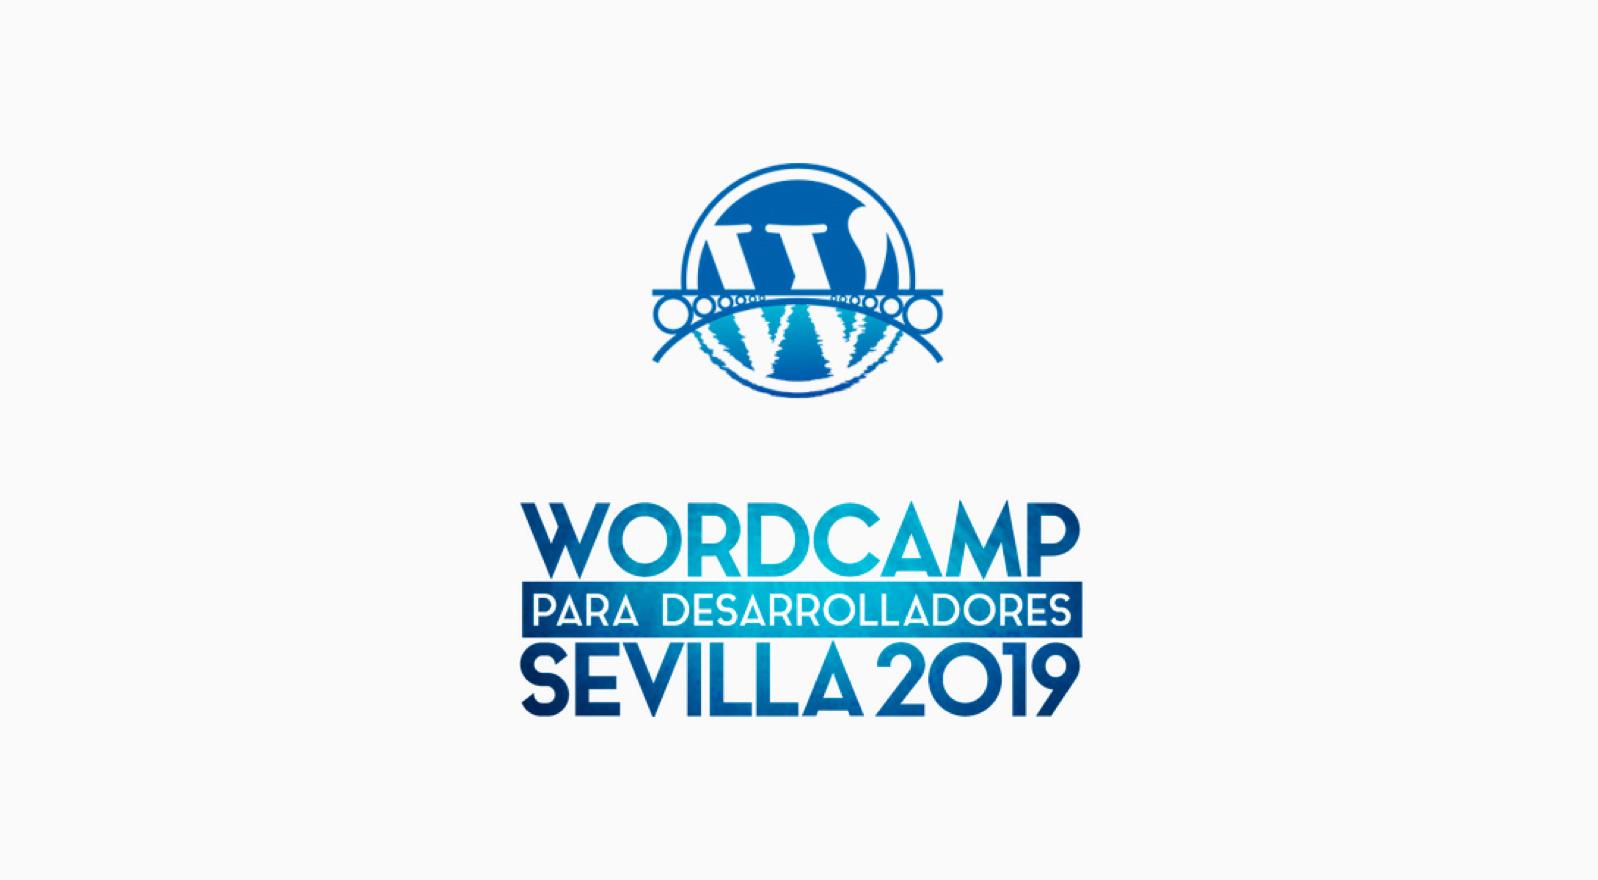 wordcamp-sevilla-devs-2019